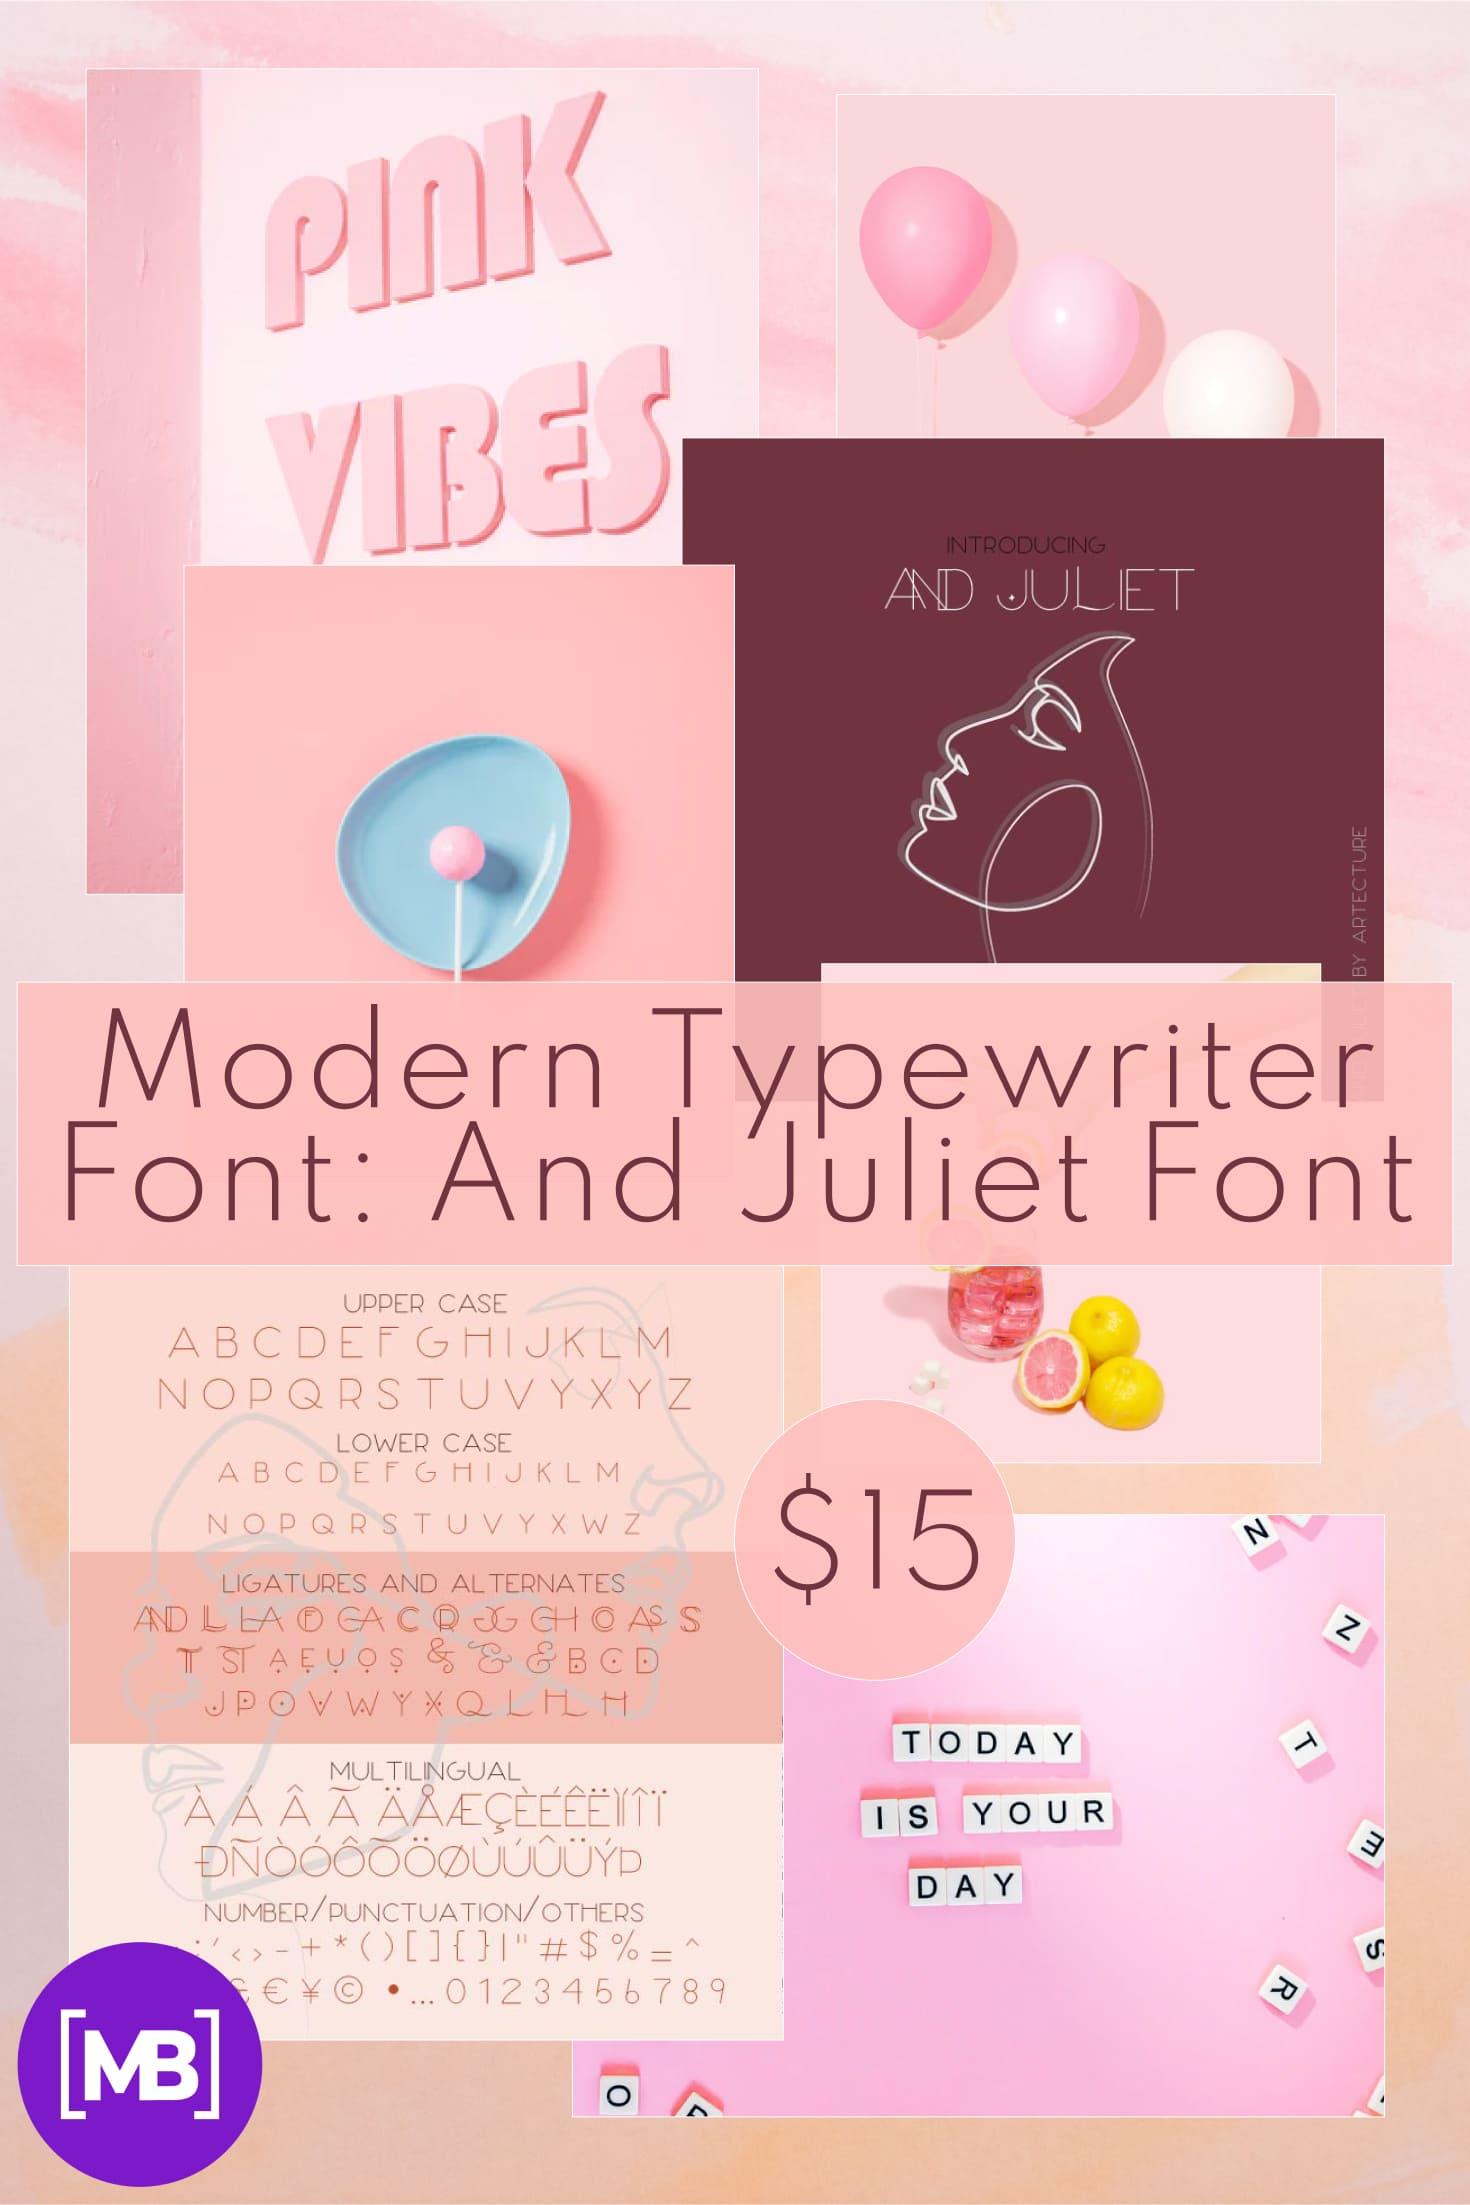 Pinterest Image: Modern Typewriter Font: And Juliet  Font.